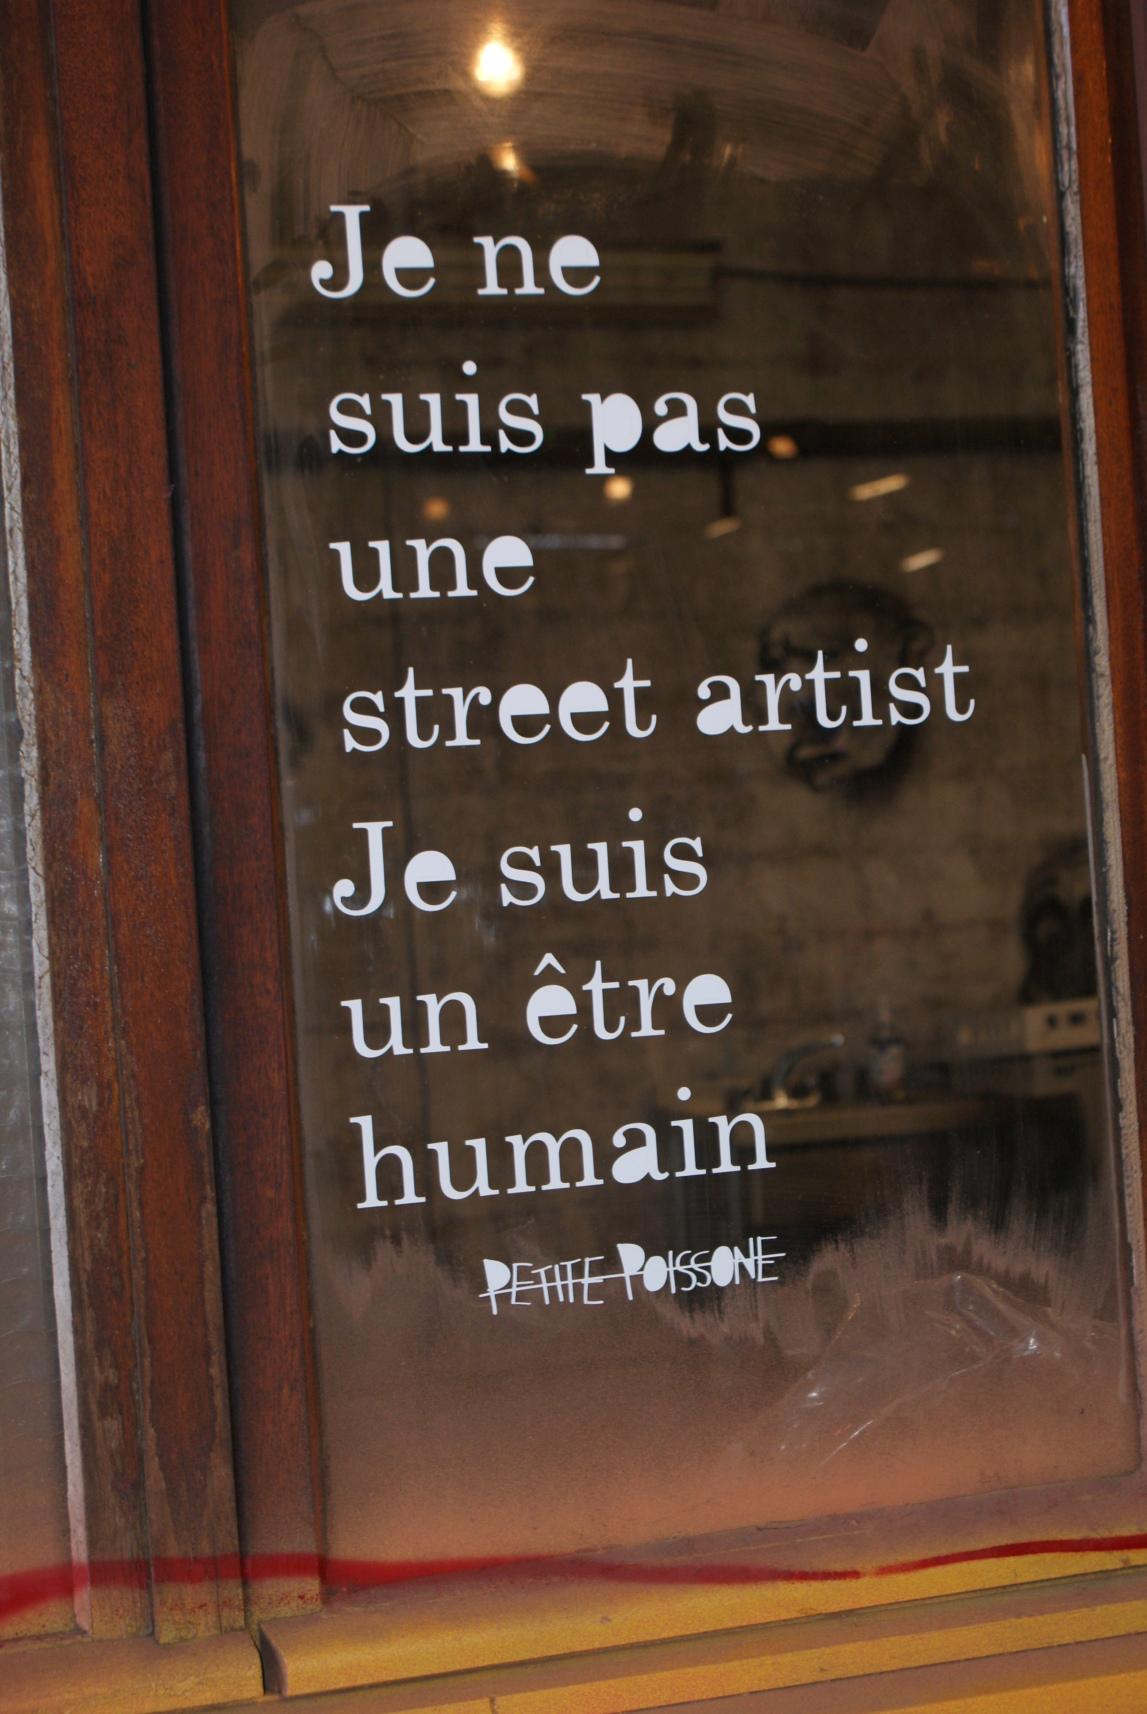 [street art-rue et manifs] Peinture fraîche, à Lyon 2019 A1030